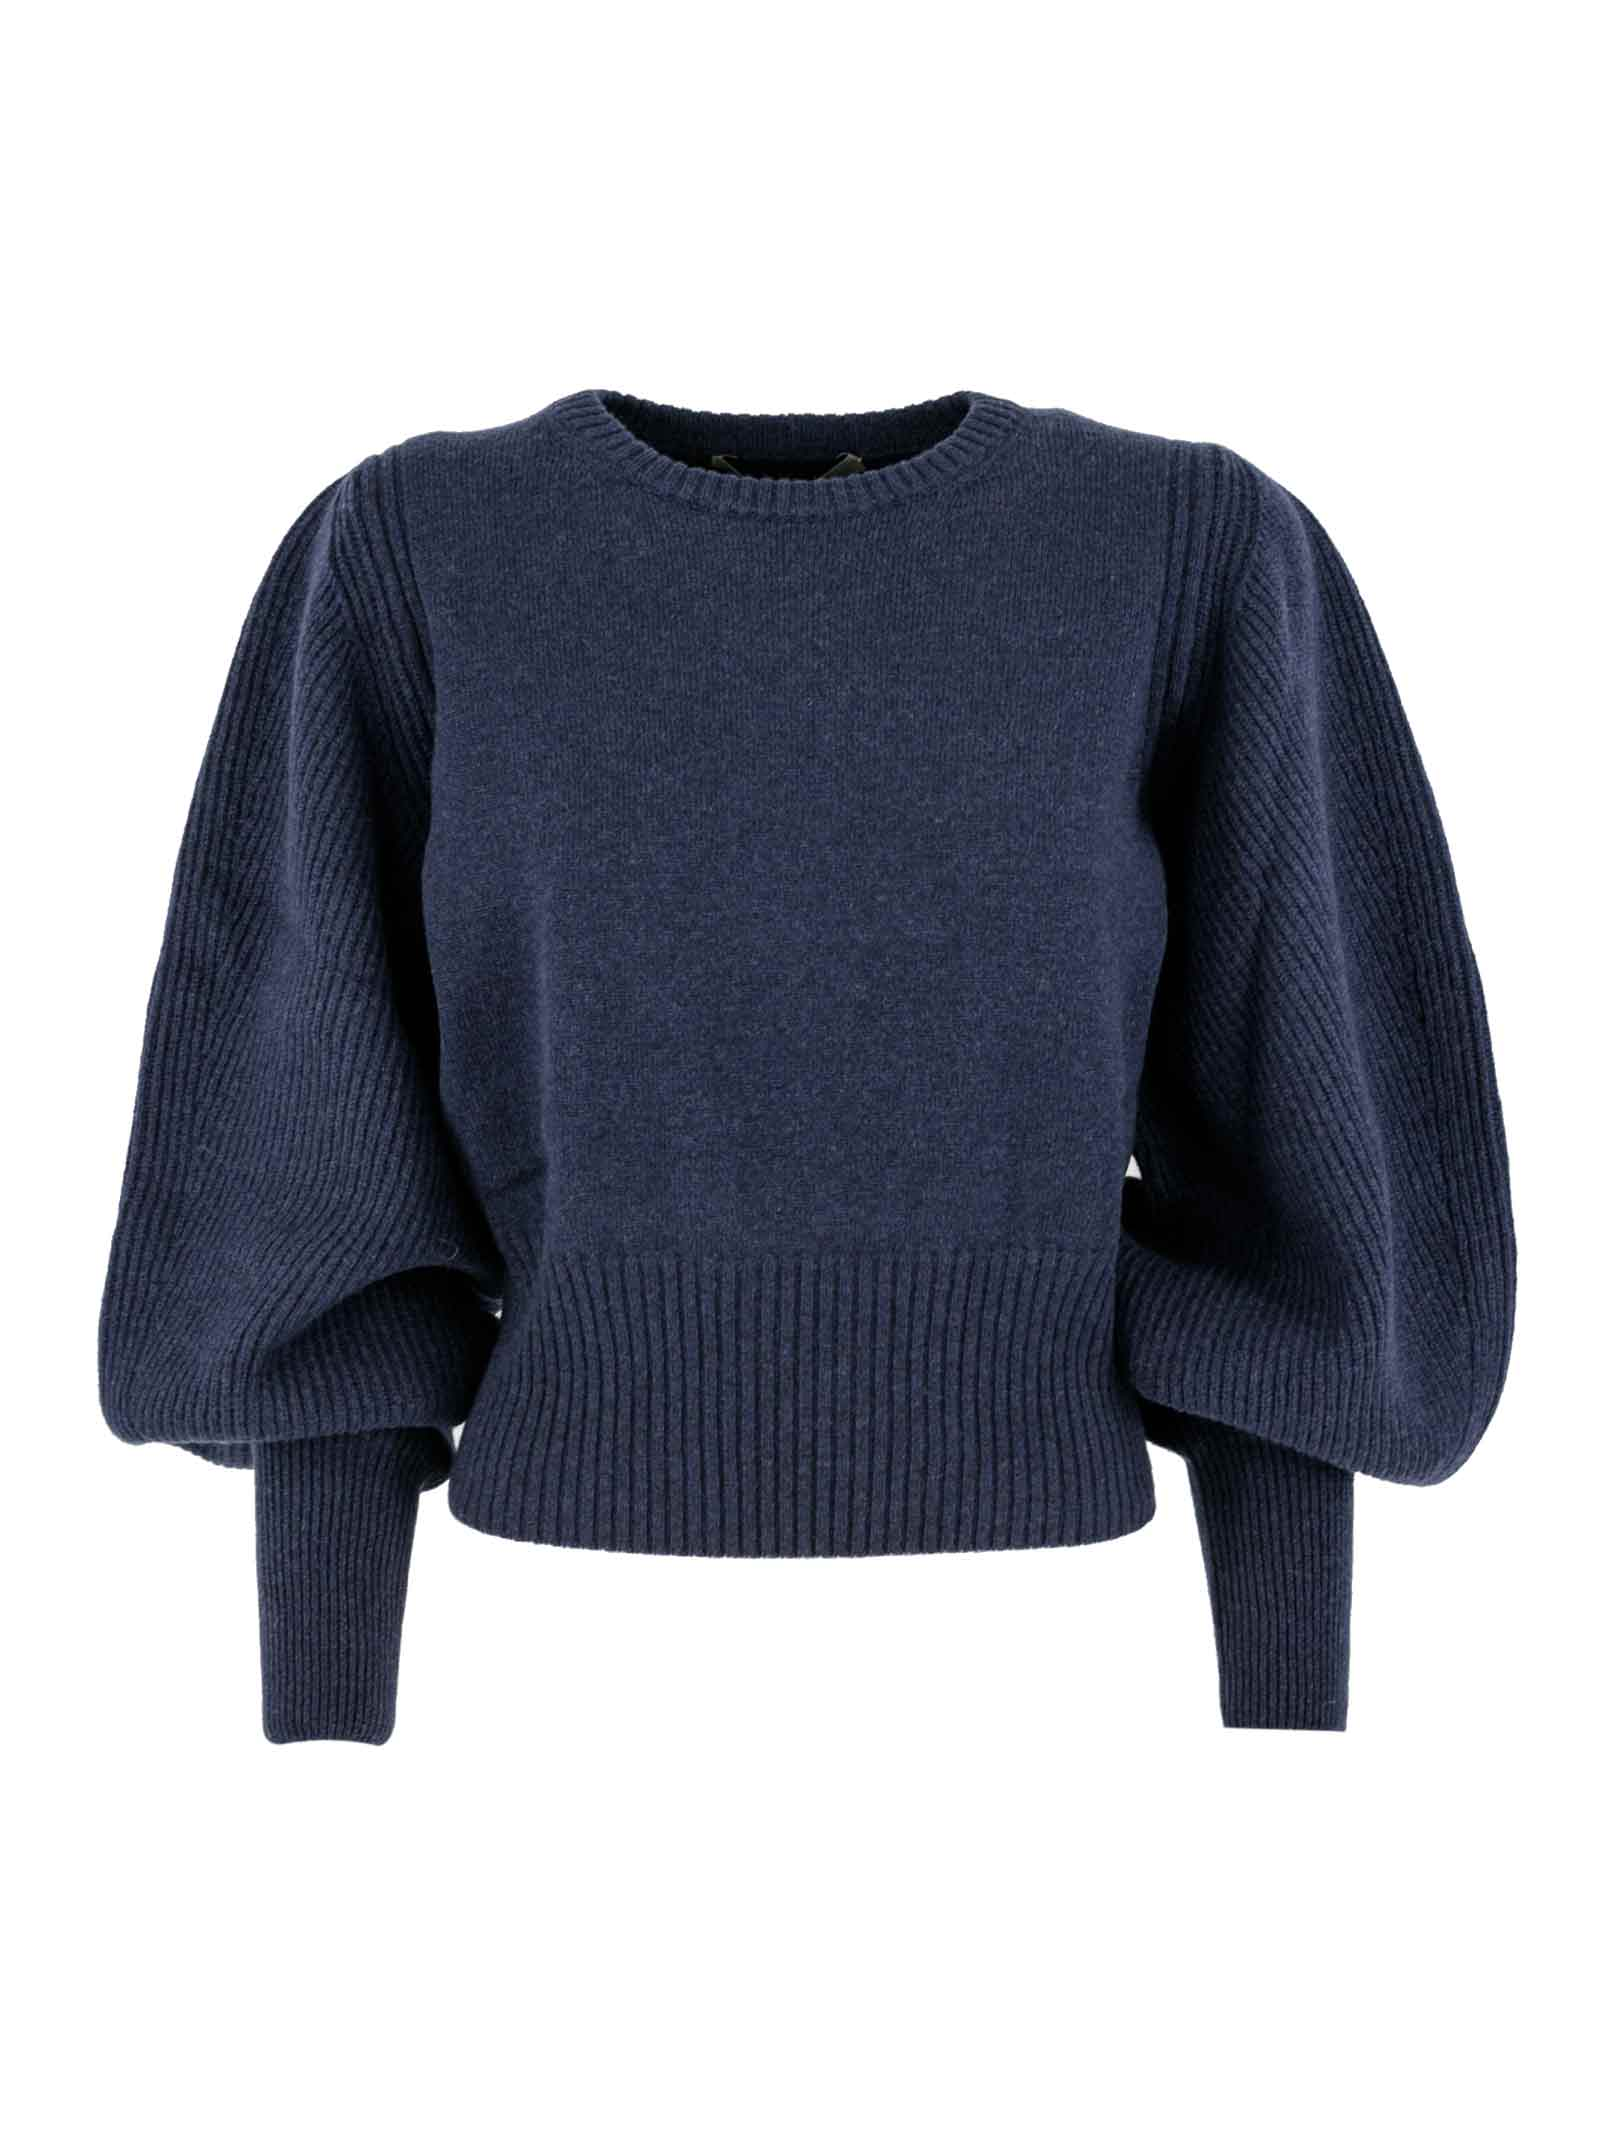 Wool-cashmere-silk Blend Sweater